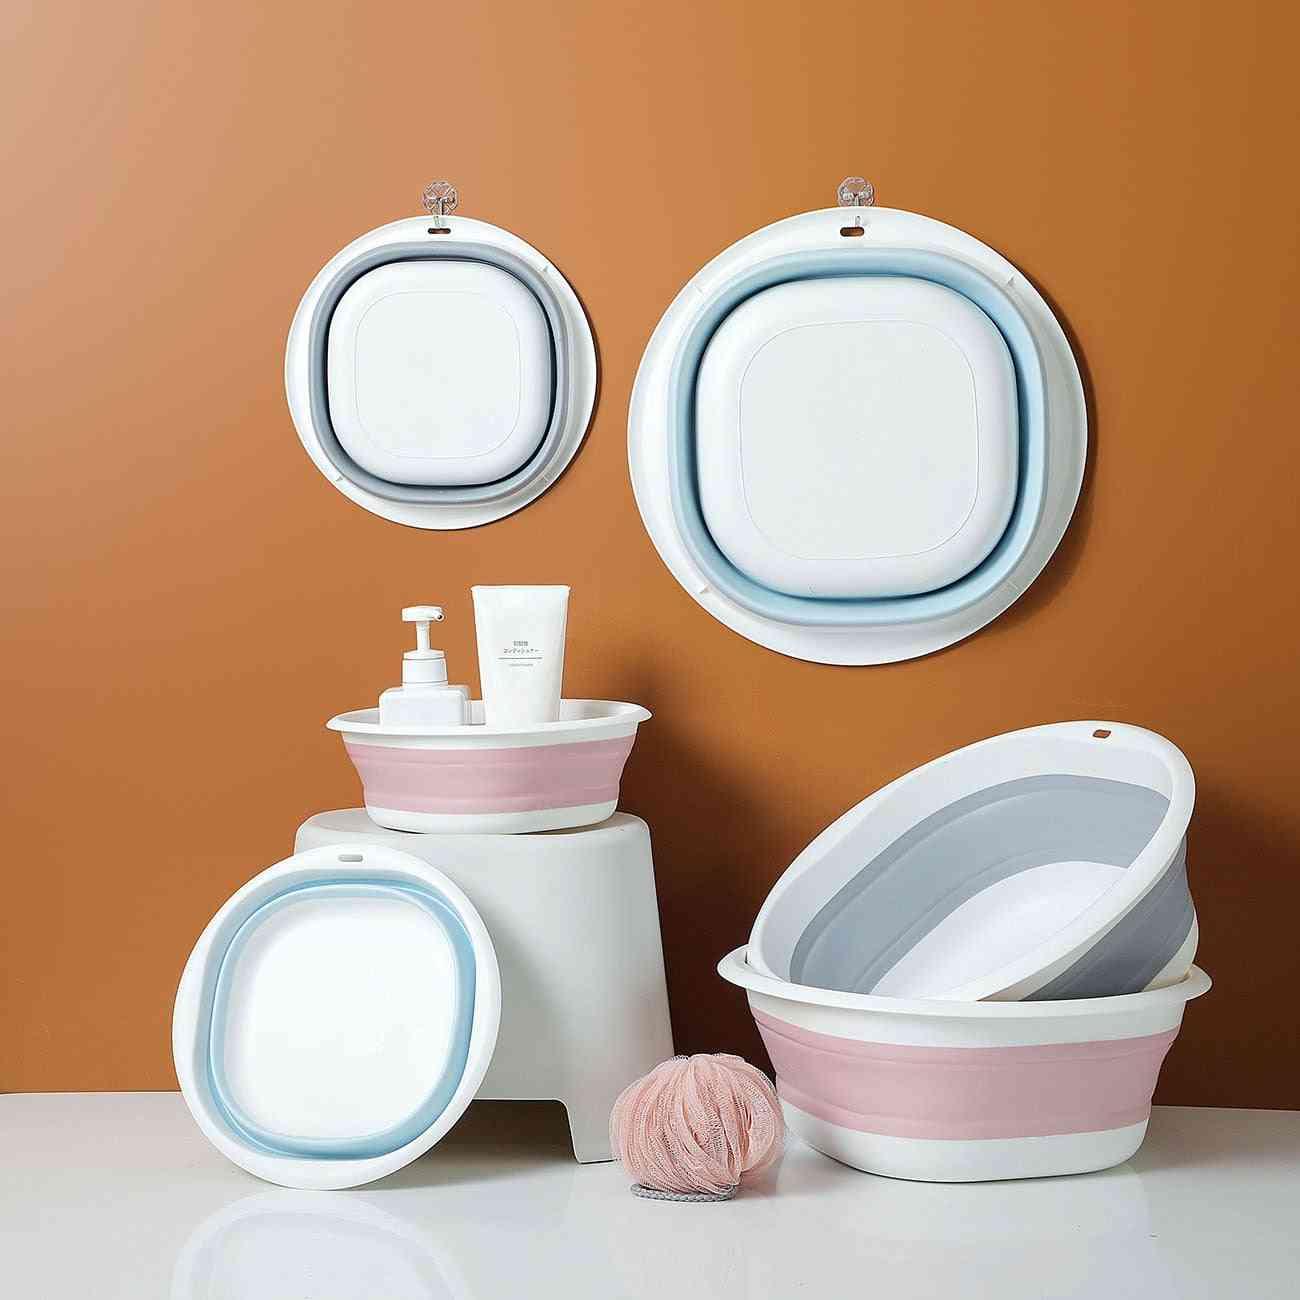 Household Folding Wash Basin Portable Sink Foot Bucket